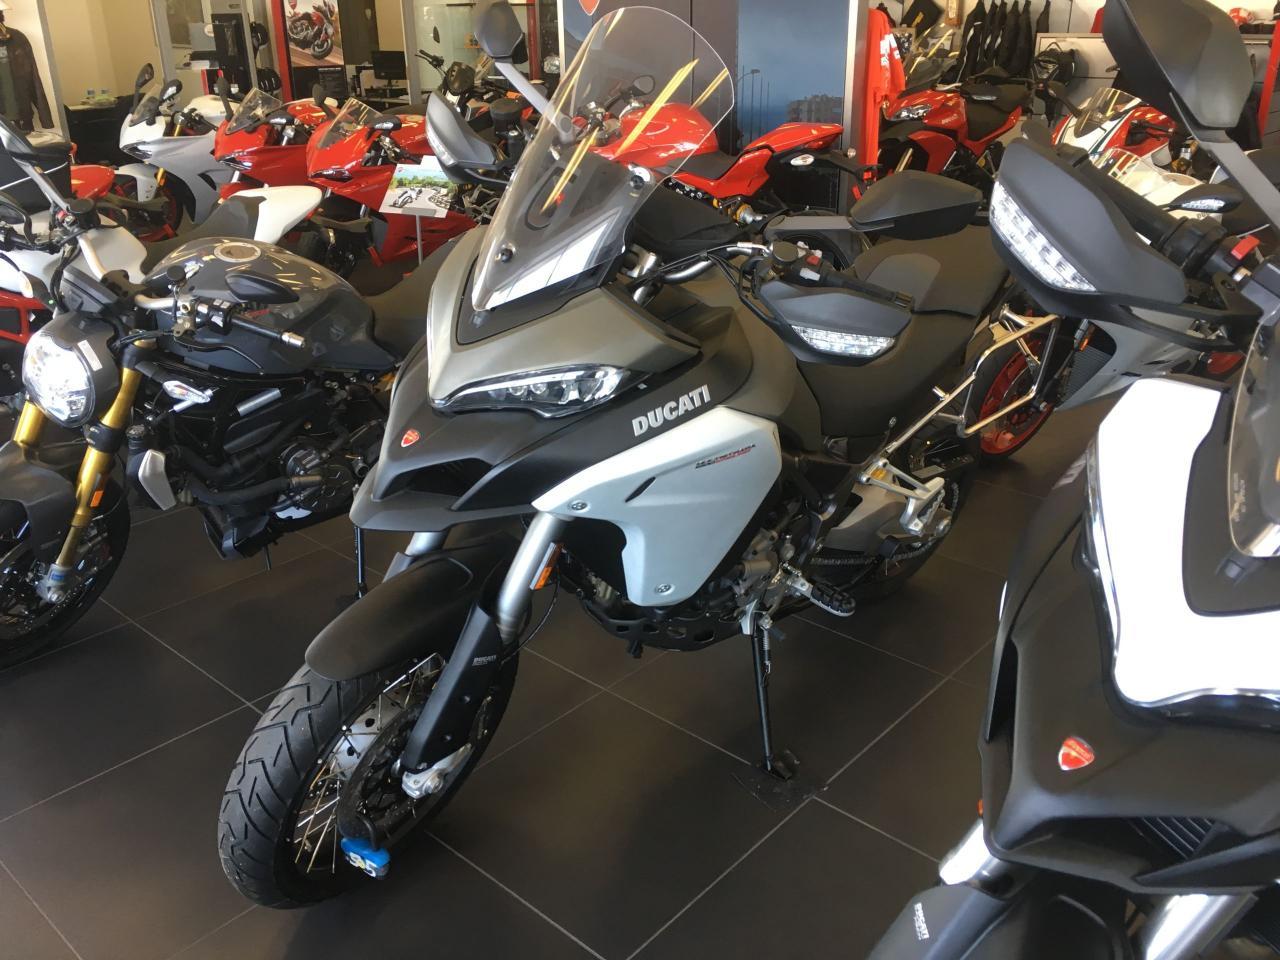 Used 2018 Ducati Multistrada 1200 Touring 1200 Enduro Touring For